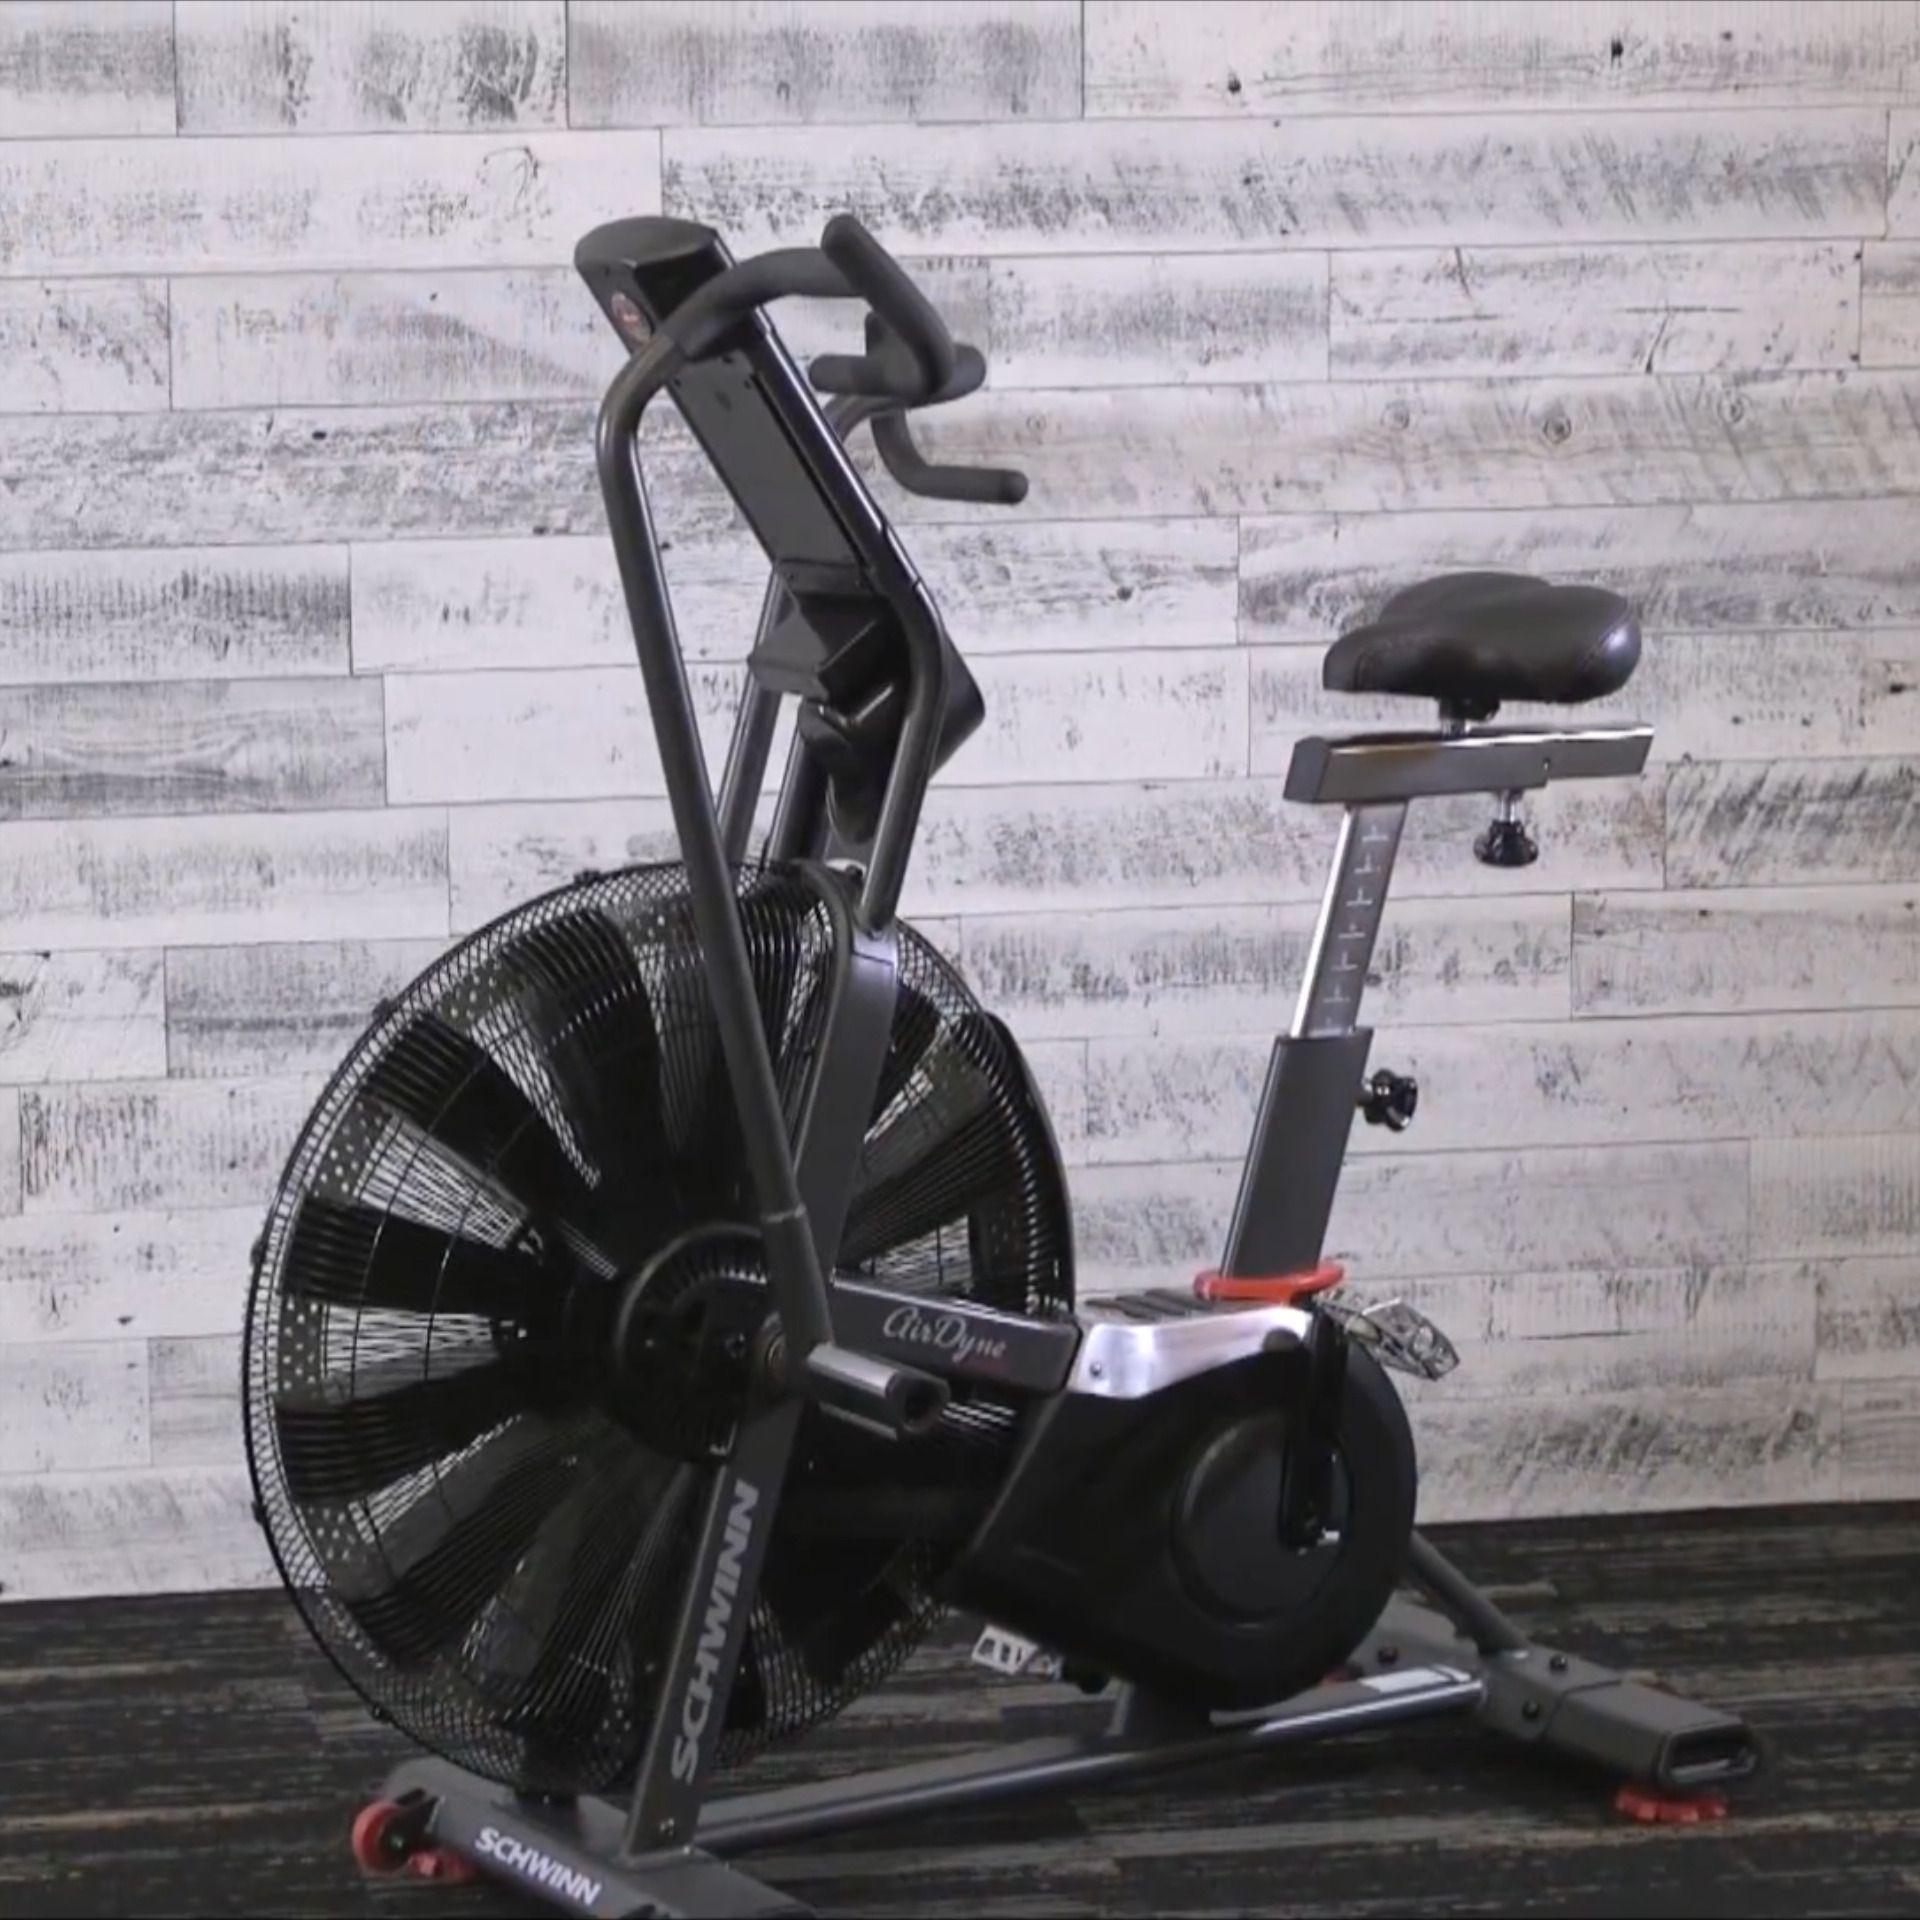 Schwinn Airdyne Calories Burned Recumbent Bike Workout Biking Workout Exercise Bikes